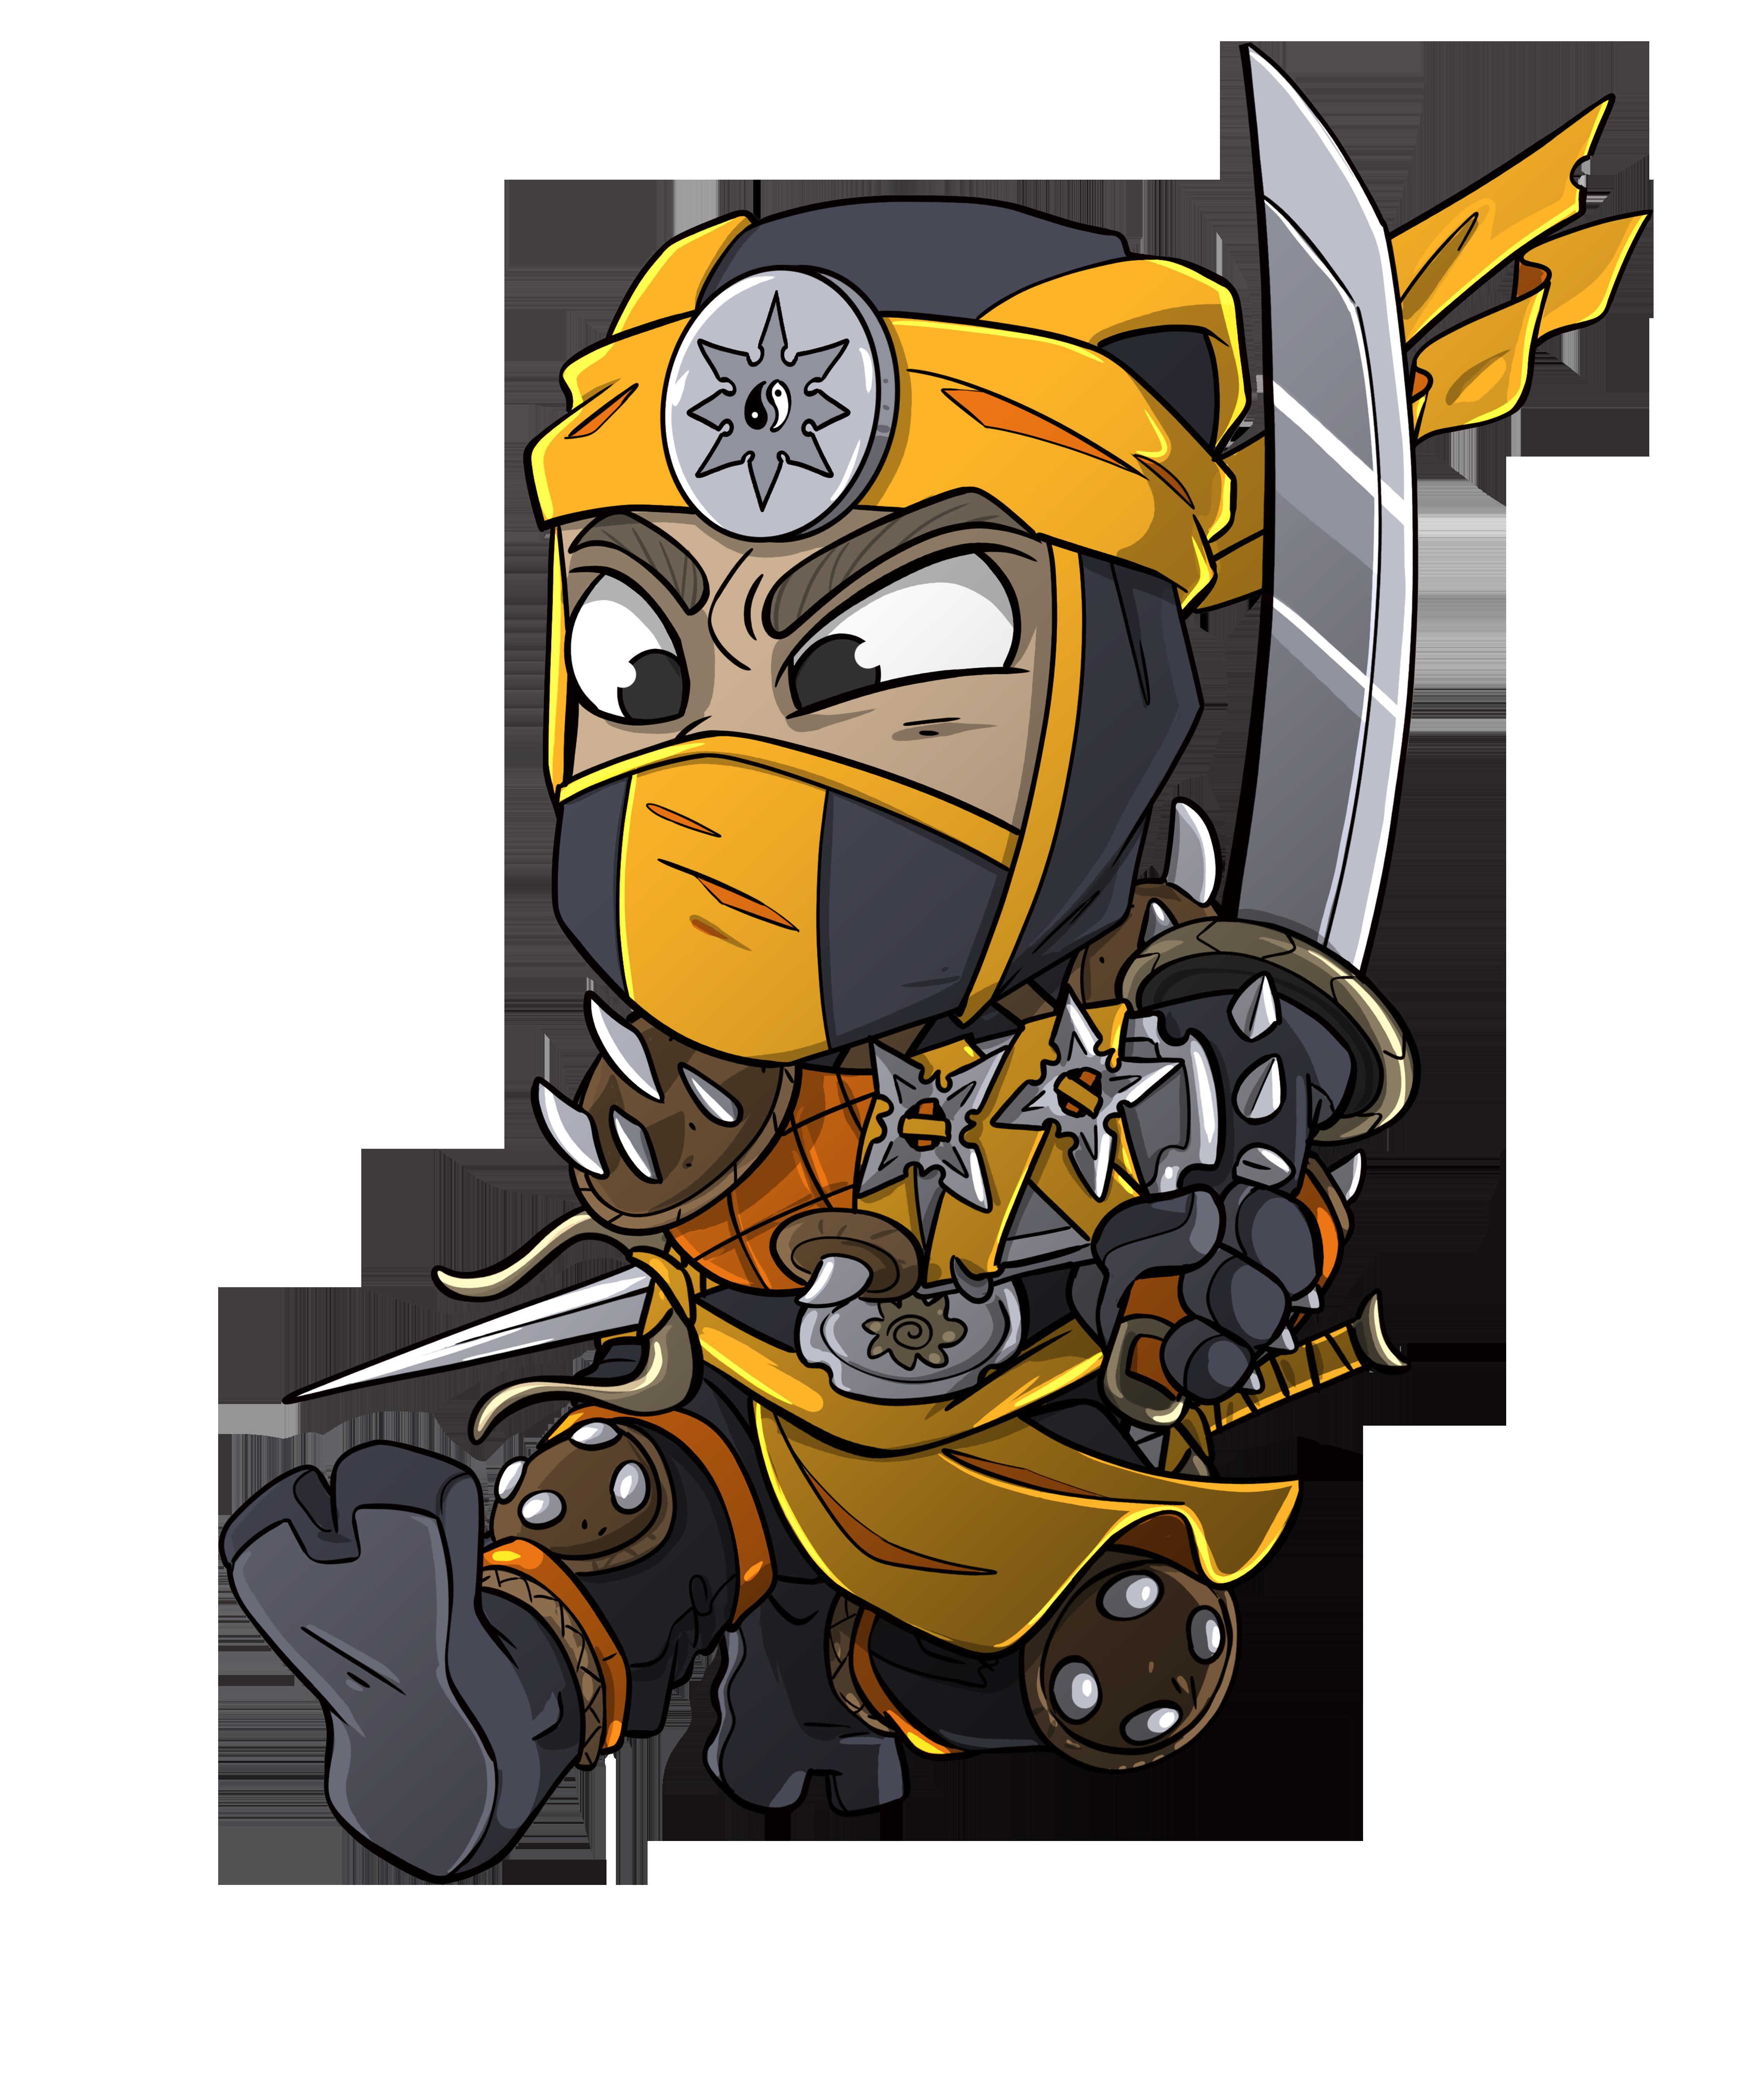 Funny Yellow Ninja Chibi Japanese Martial Arts